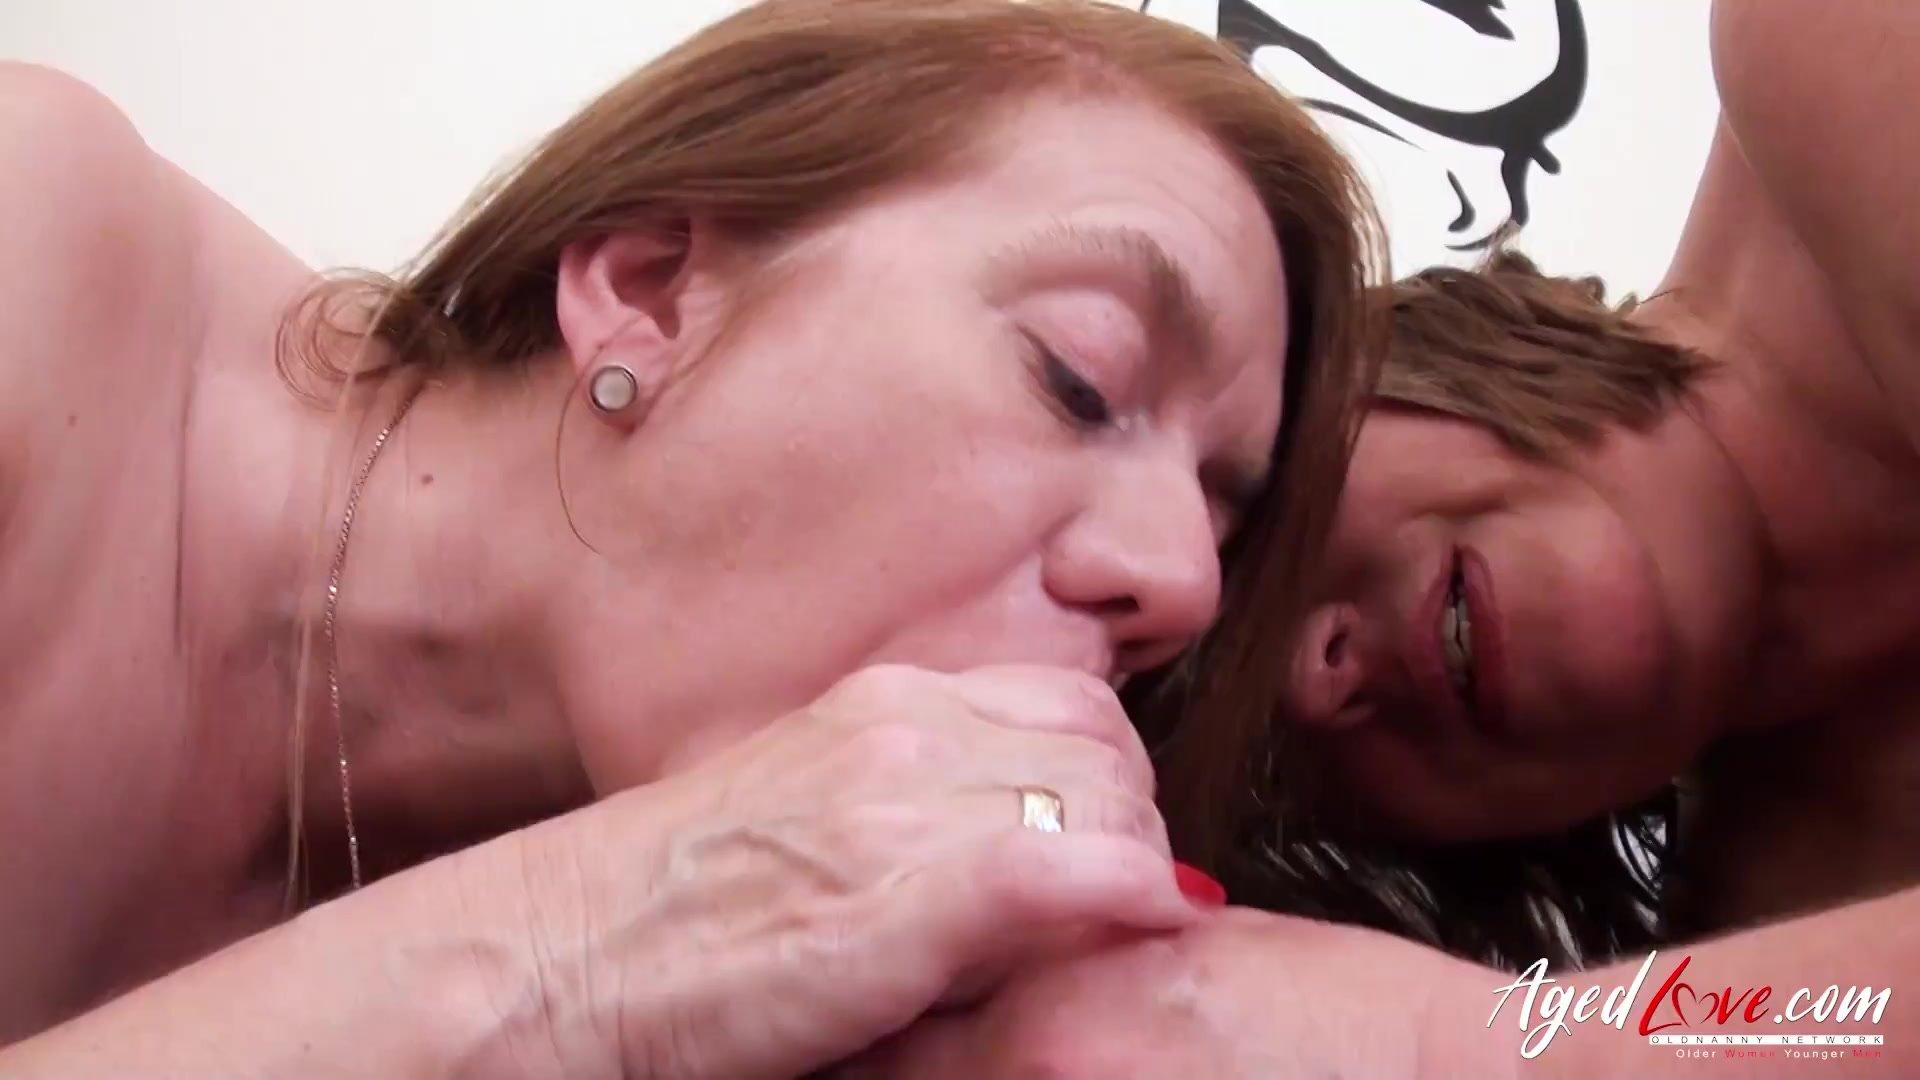 AgedLovE Busty British Matures Hardcore Sex Video